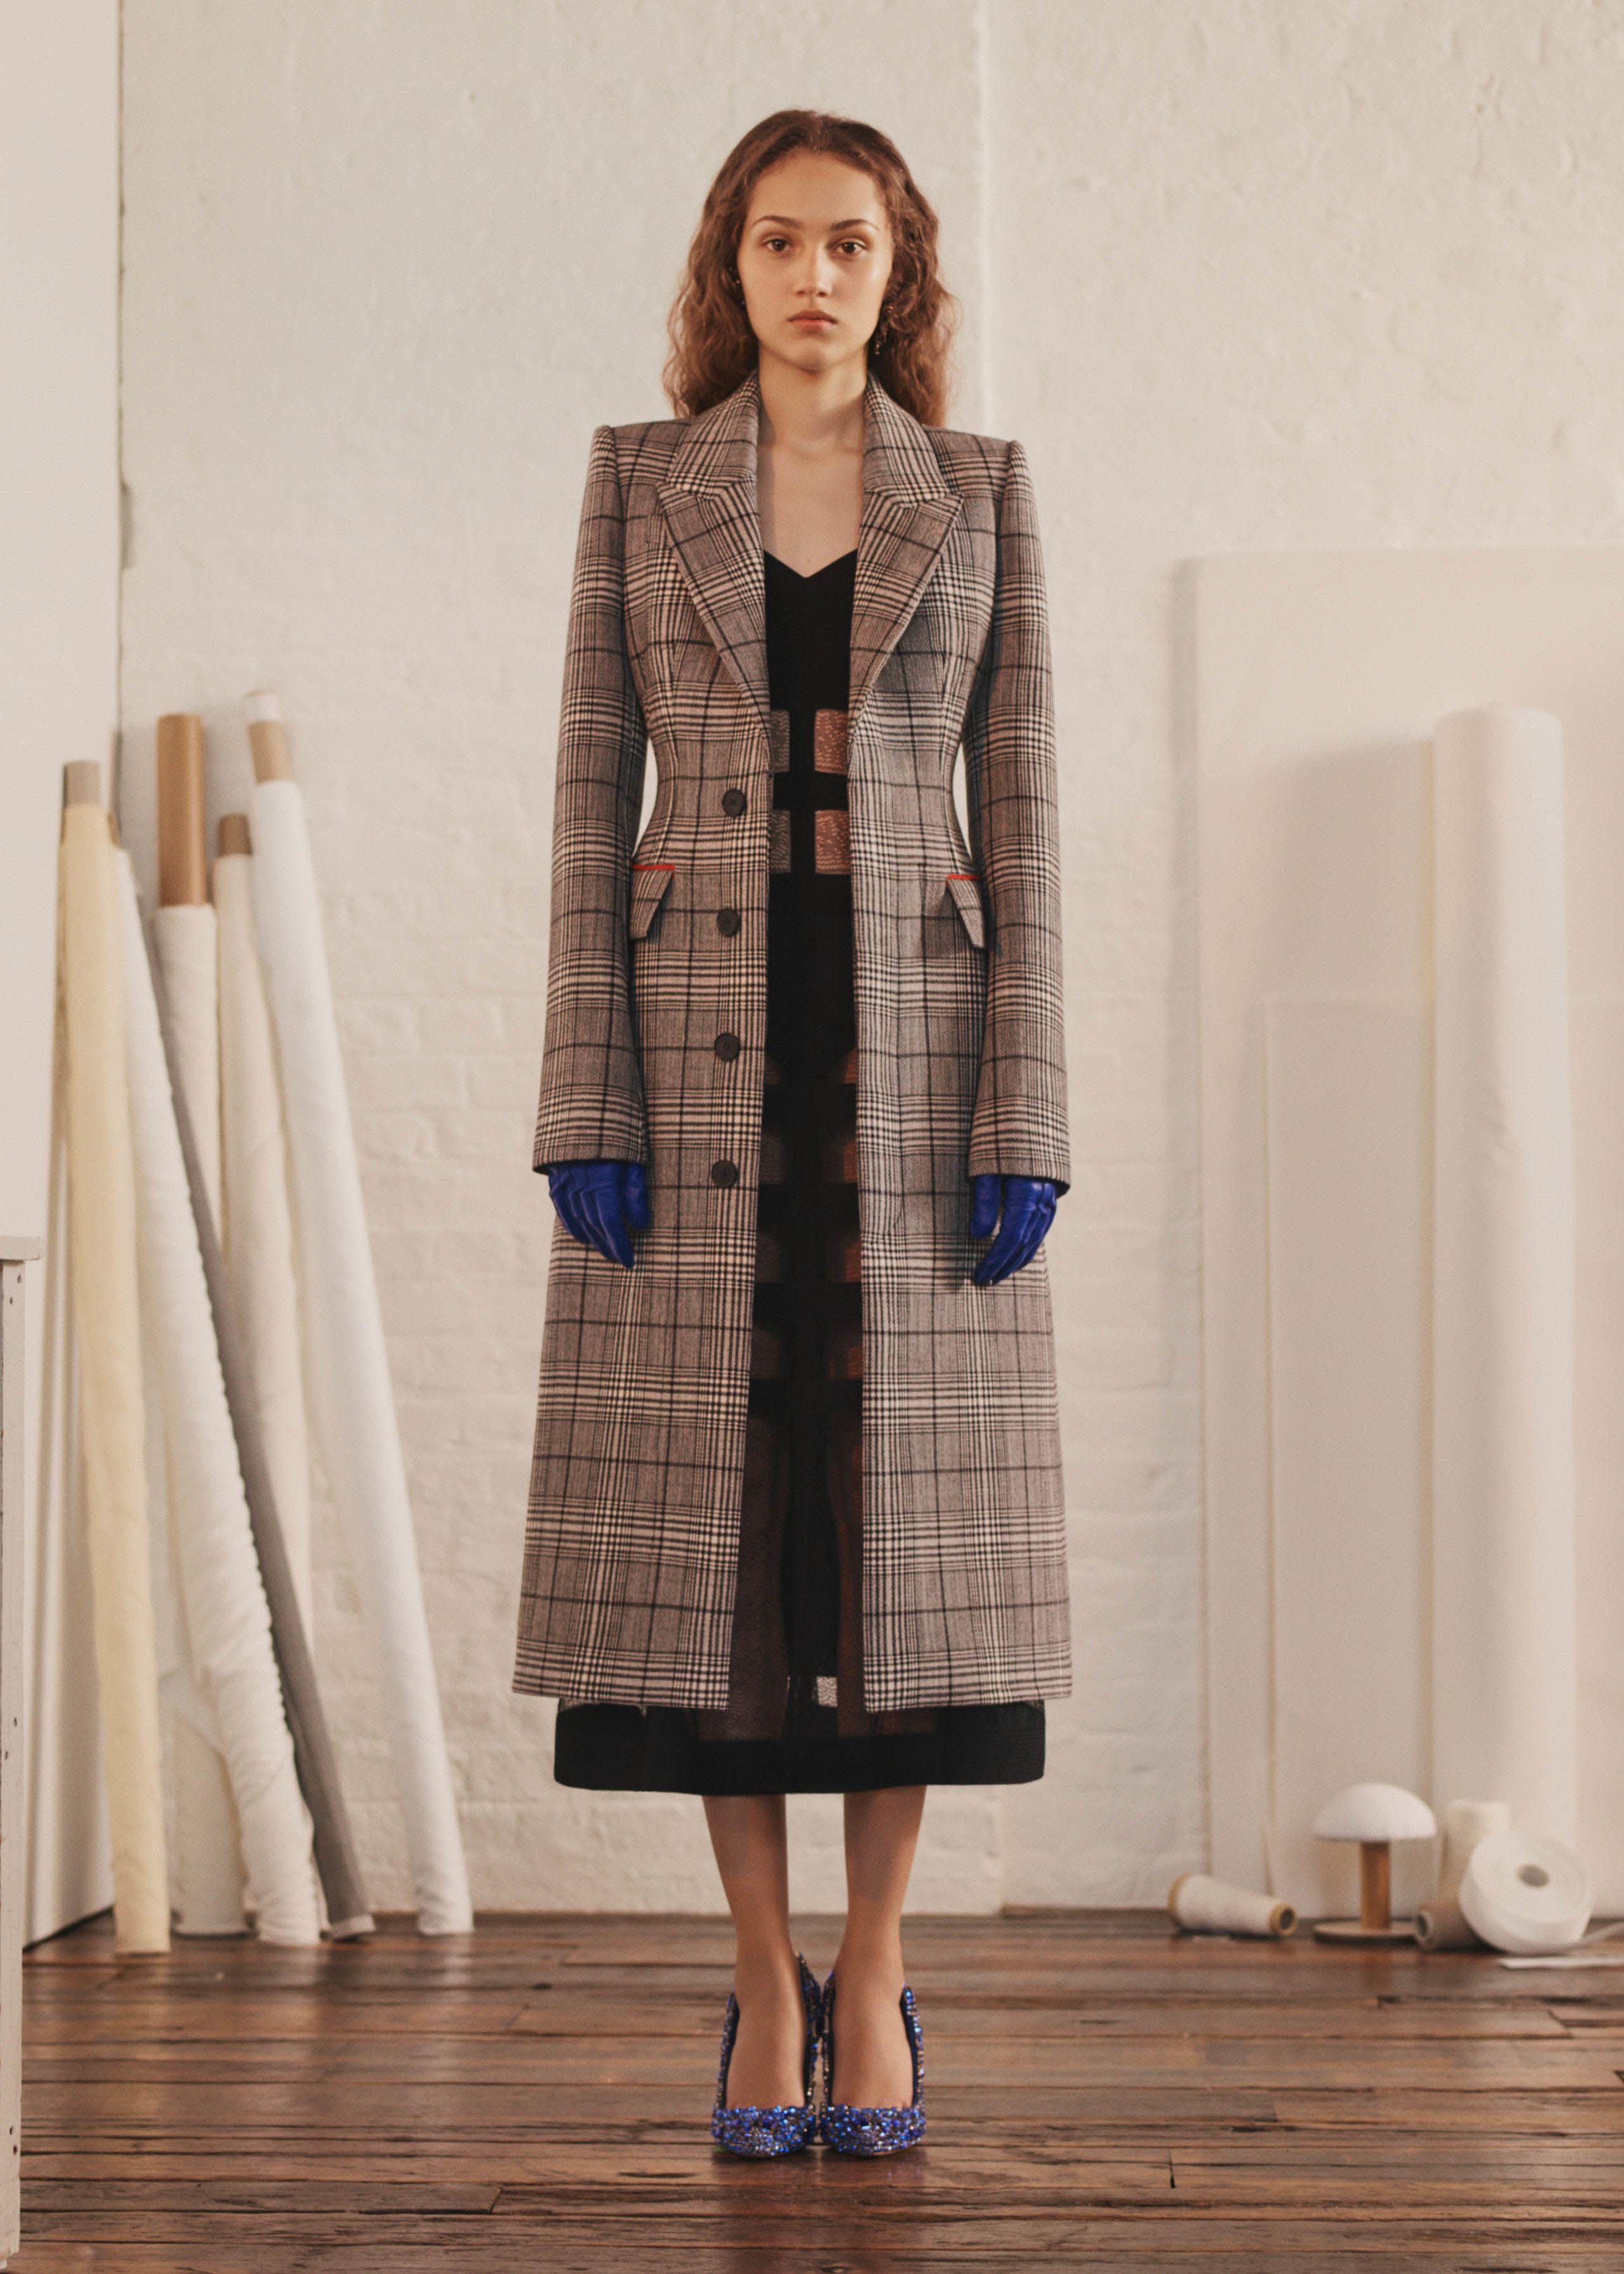 Серый пиджак : обзор модных сочетаний Мода от Кутюр. Ru